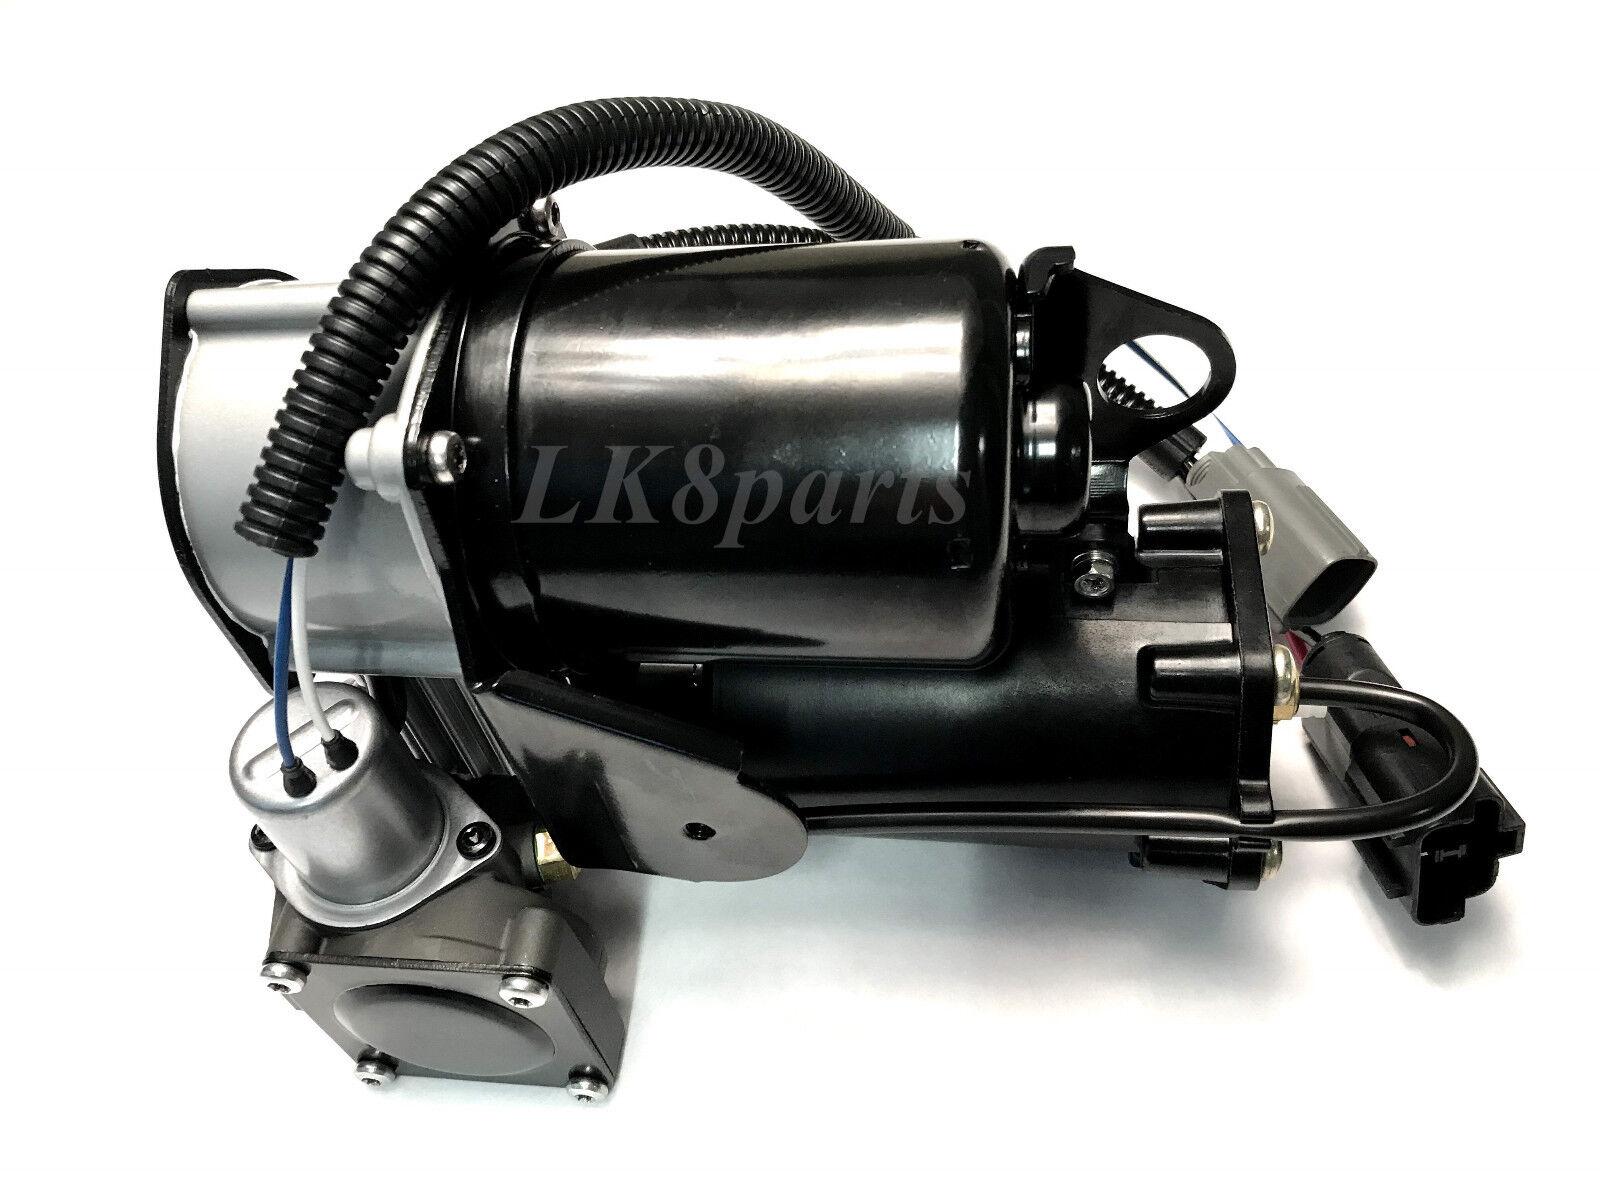 land compressor rv e range category rover landrover suspension air pump